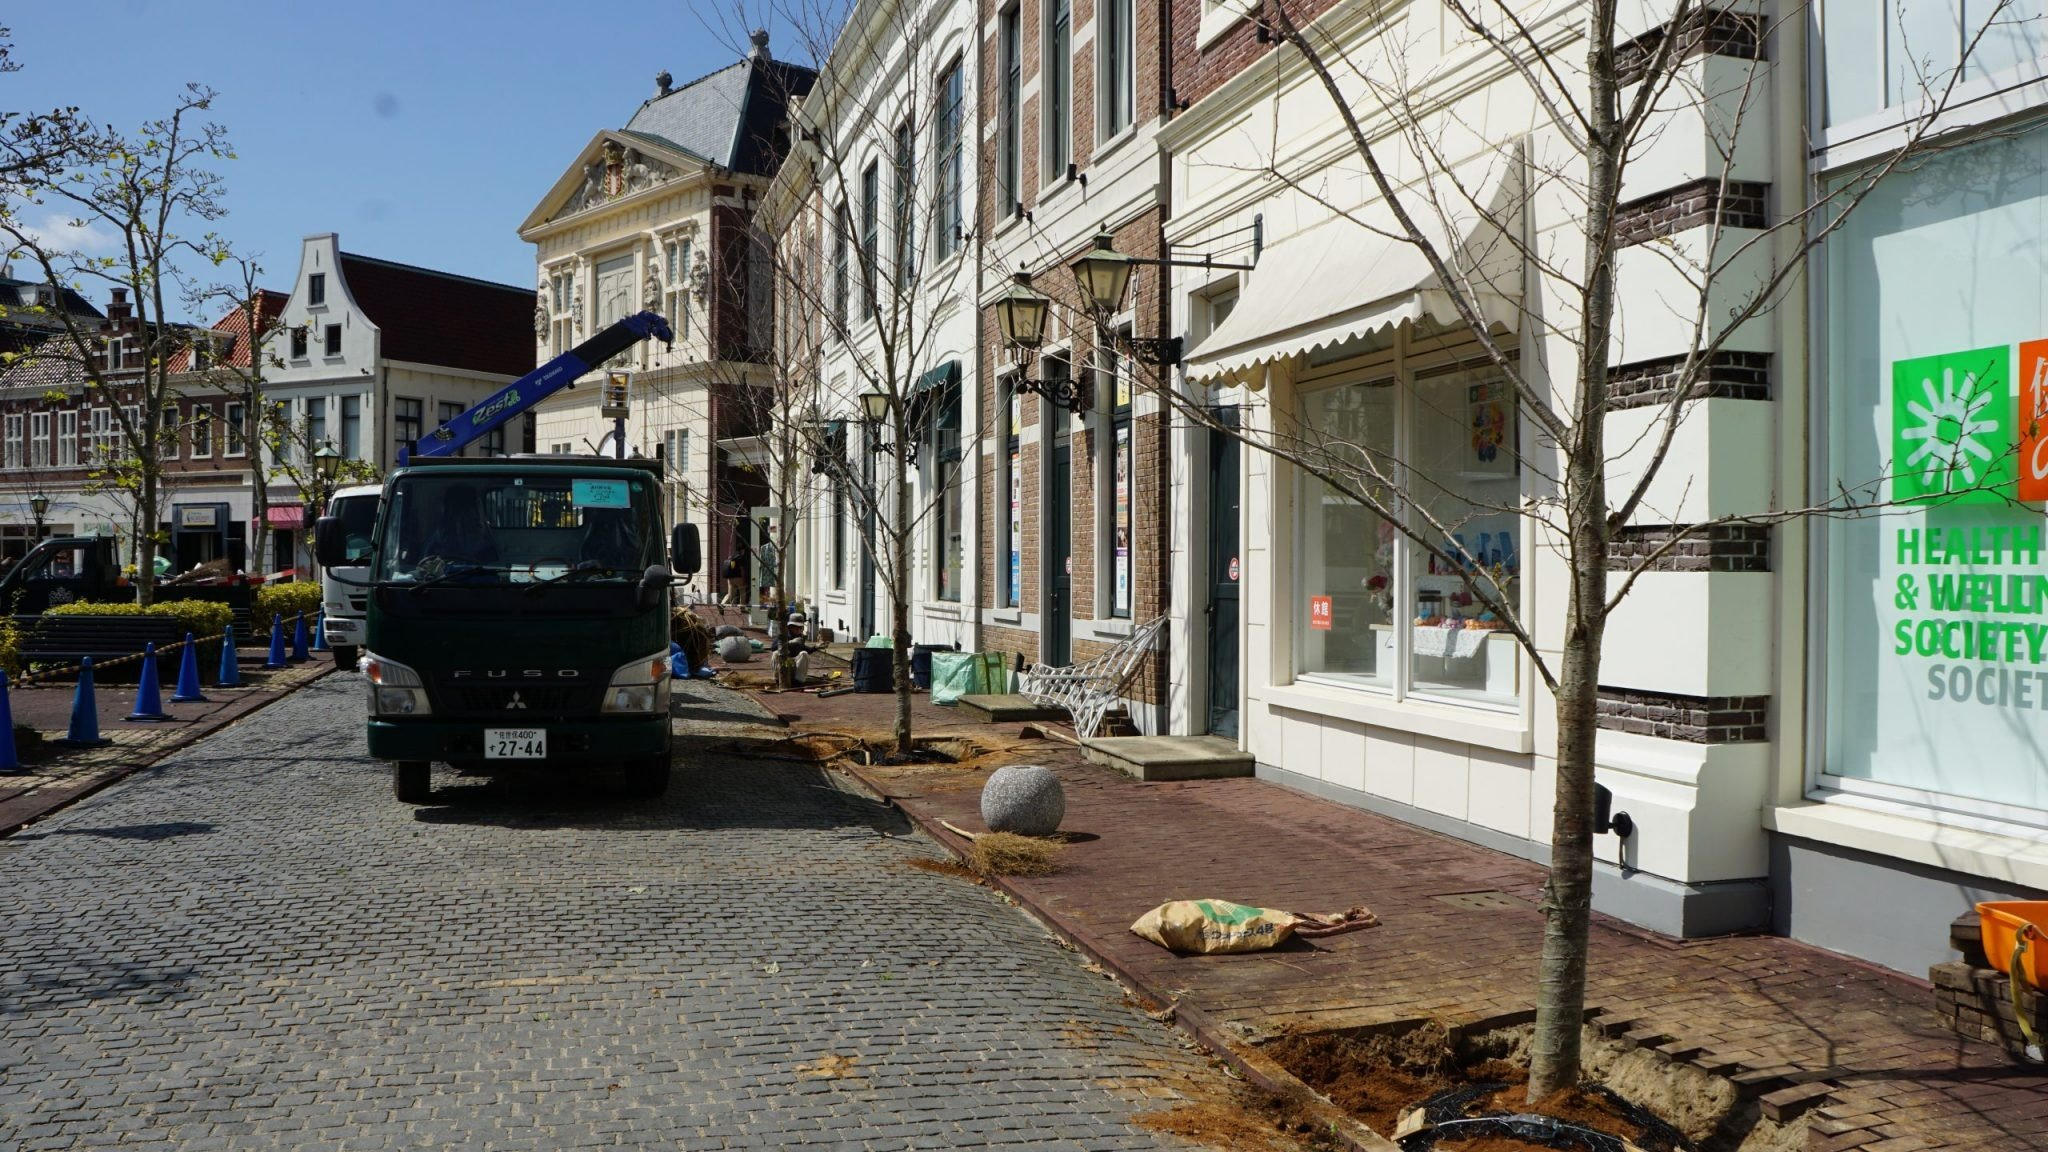 Huis ten Bosch-tree planting